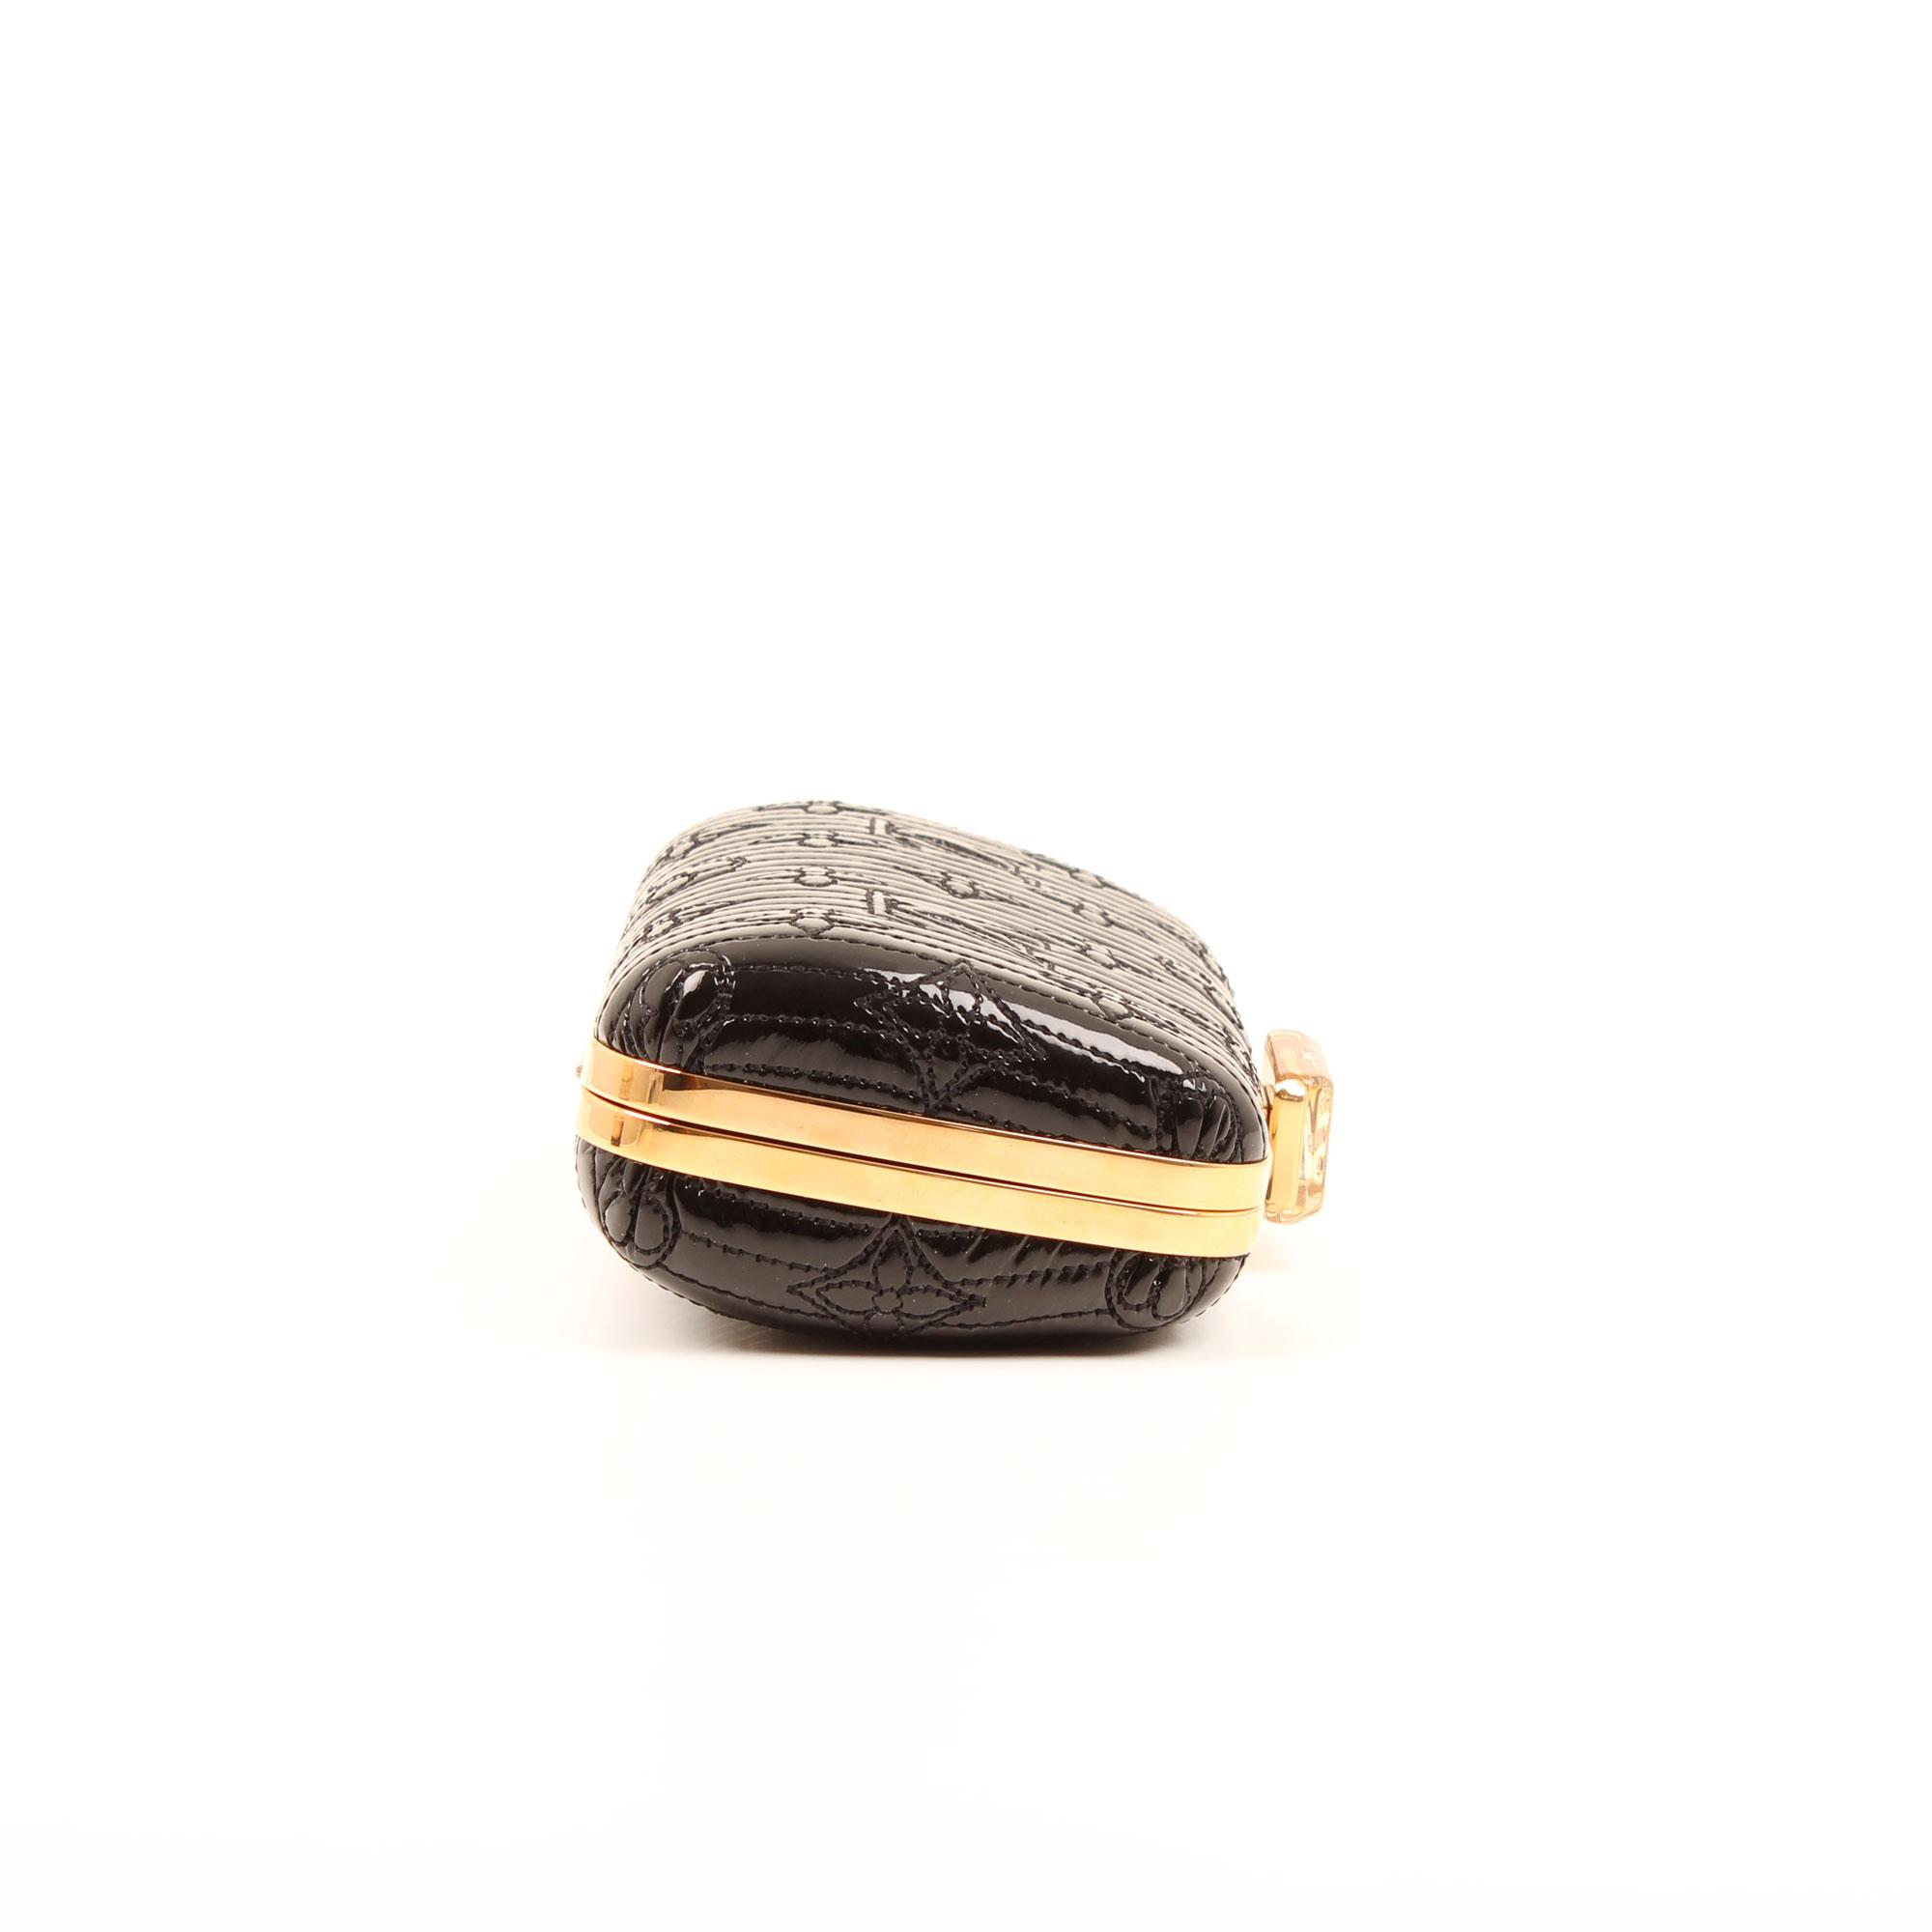 Imagen general del clutch louis vuitton motard afterdark negro frontal